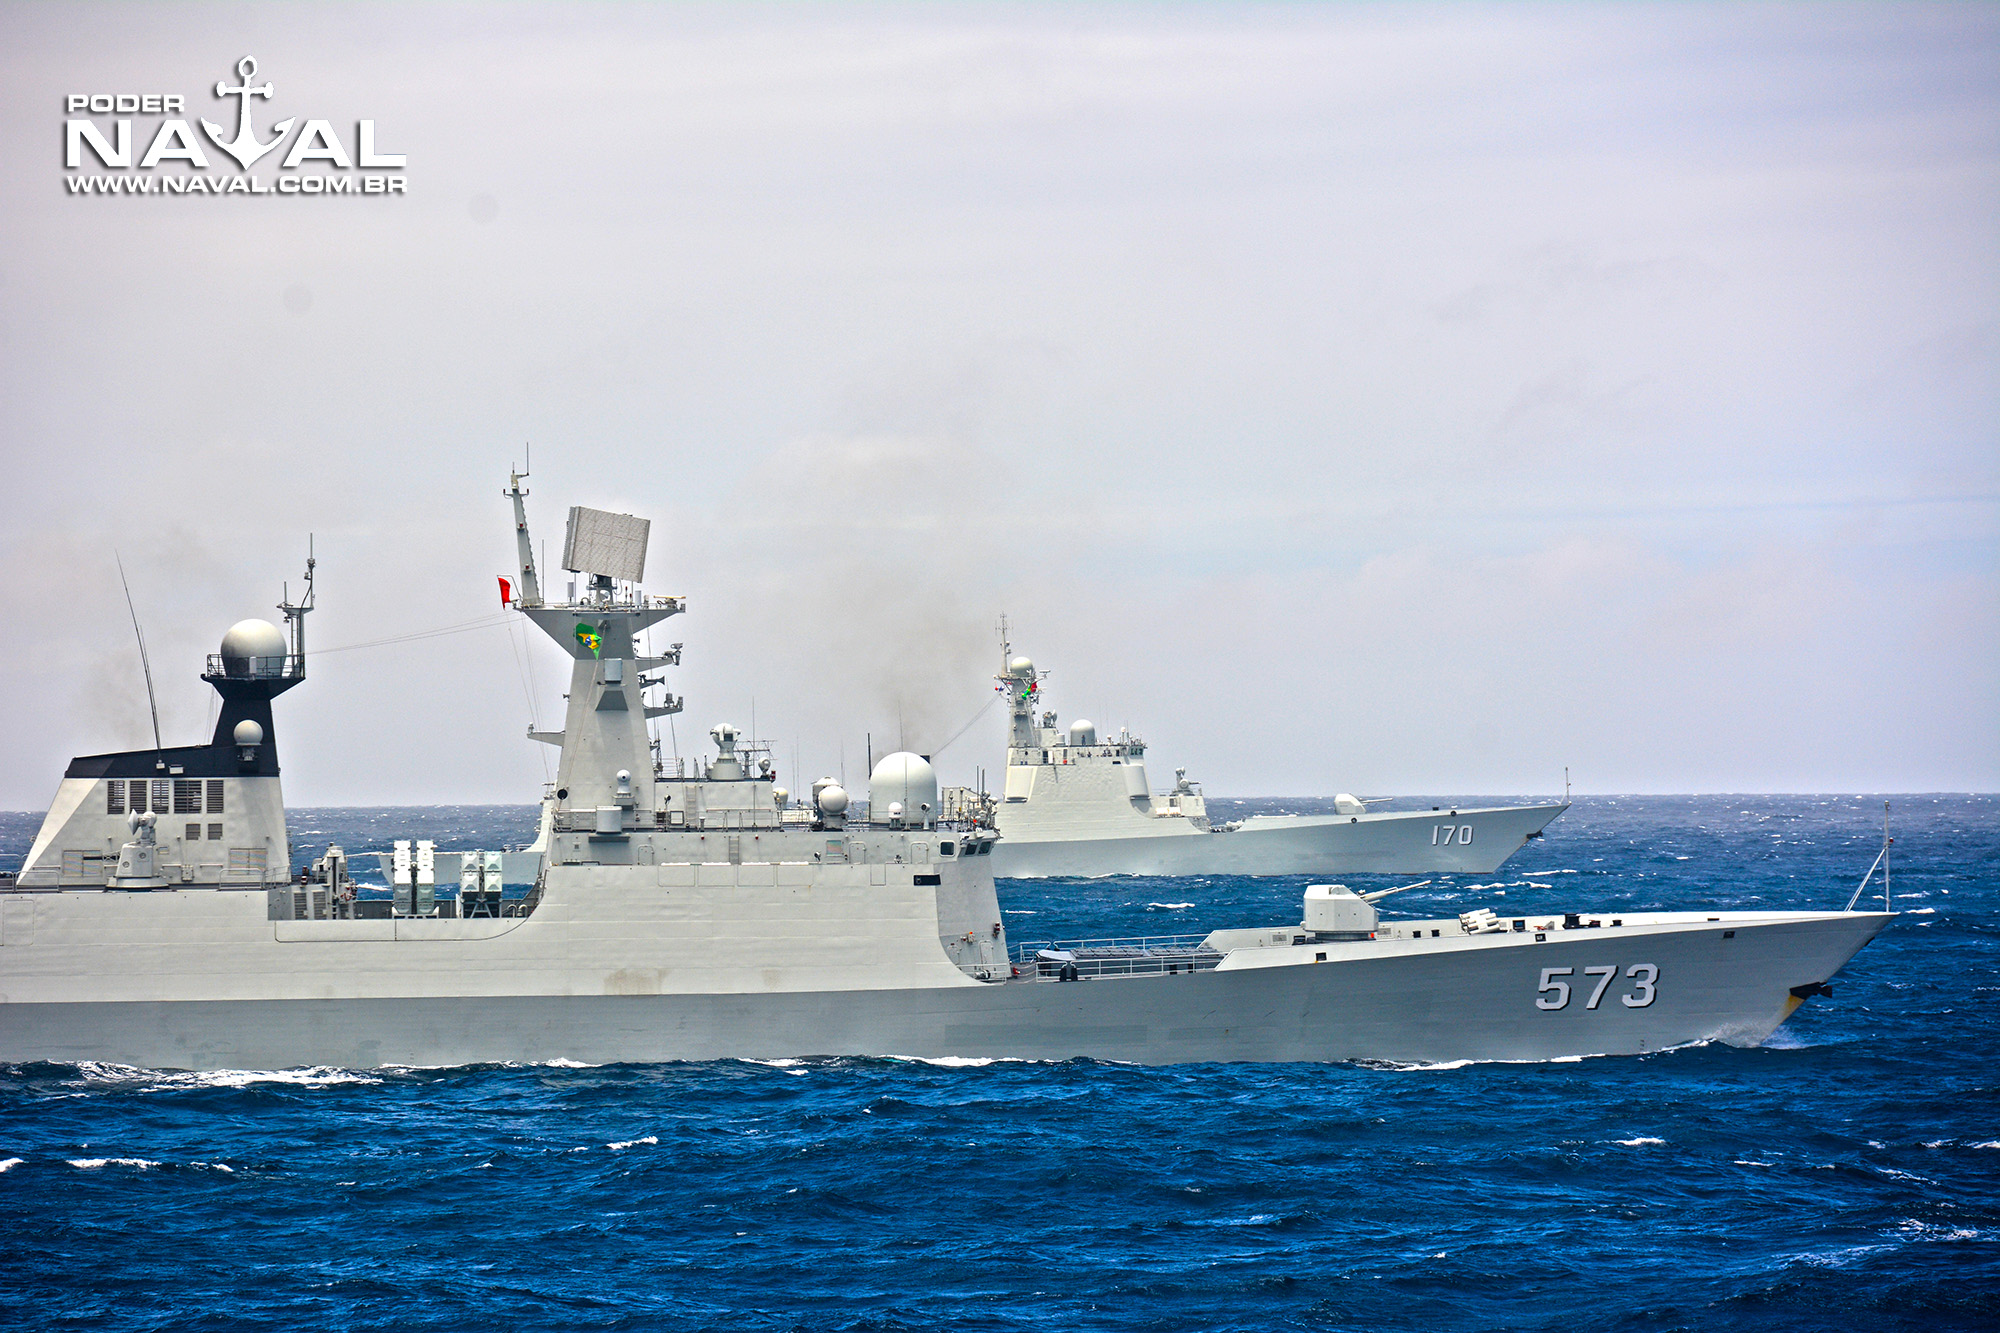 Passex PLA Navy 425a